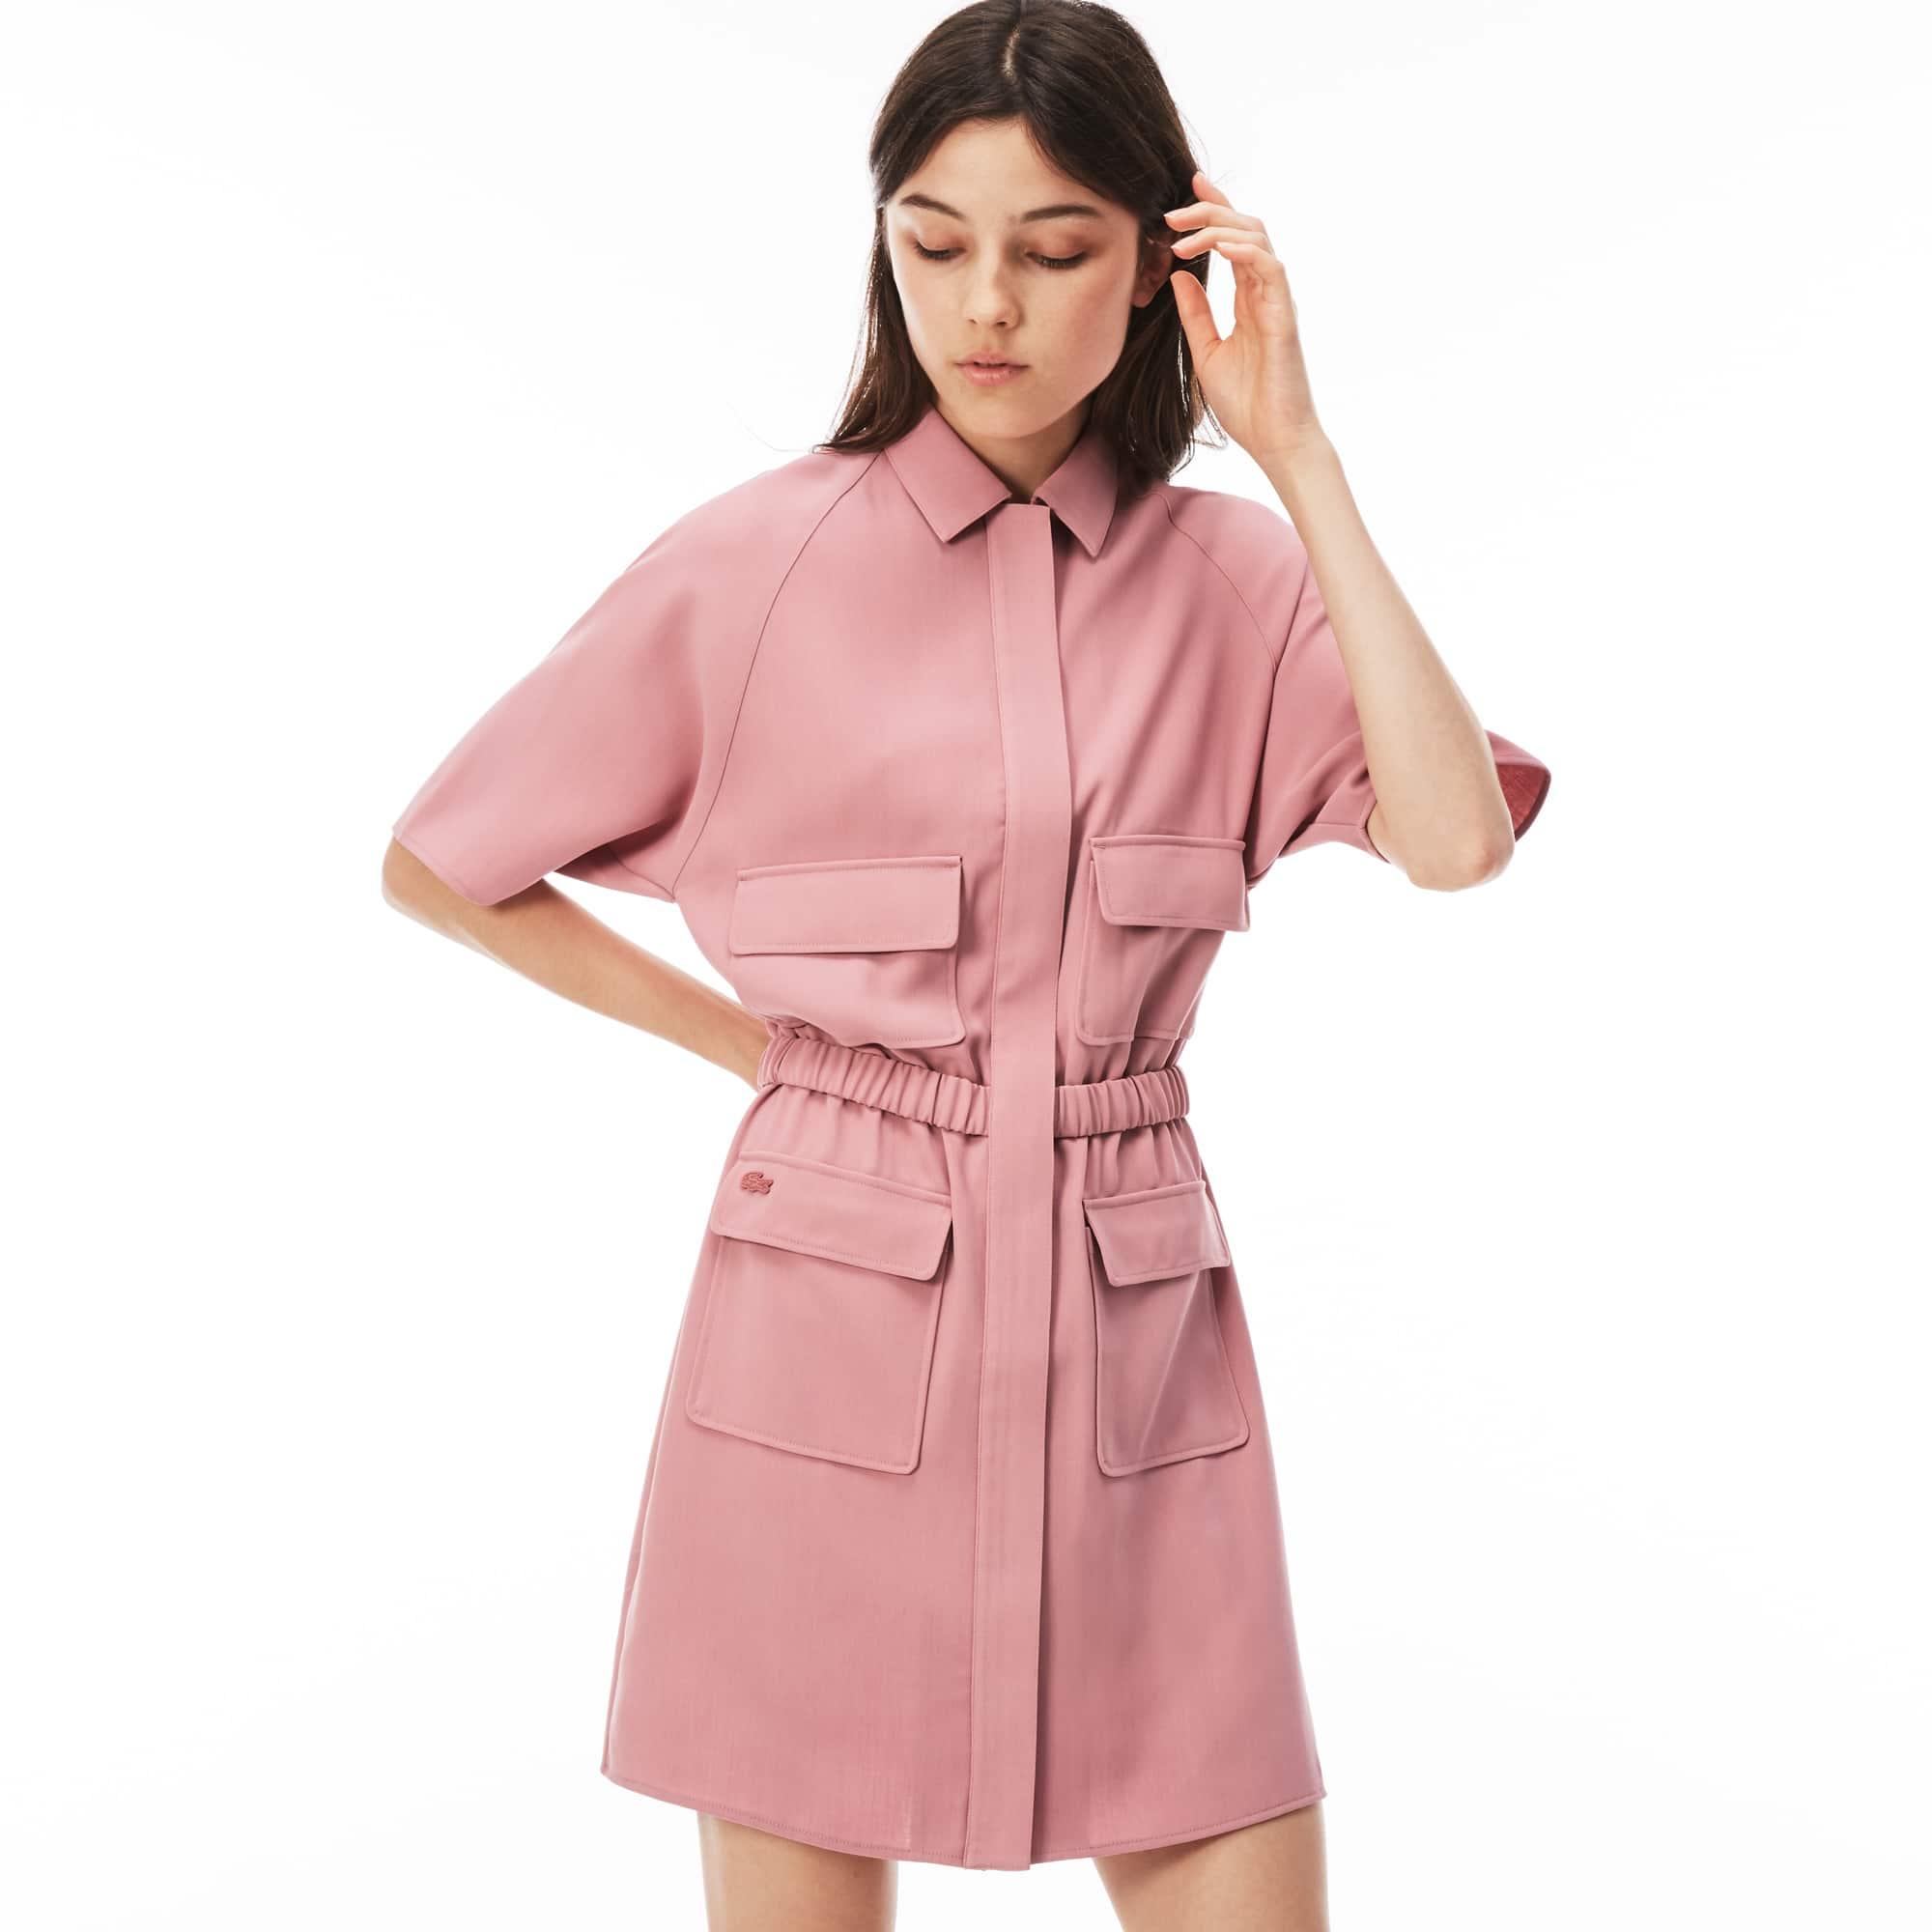 Women's Lacoste LIVE Crepe Zip Dress